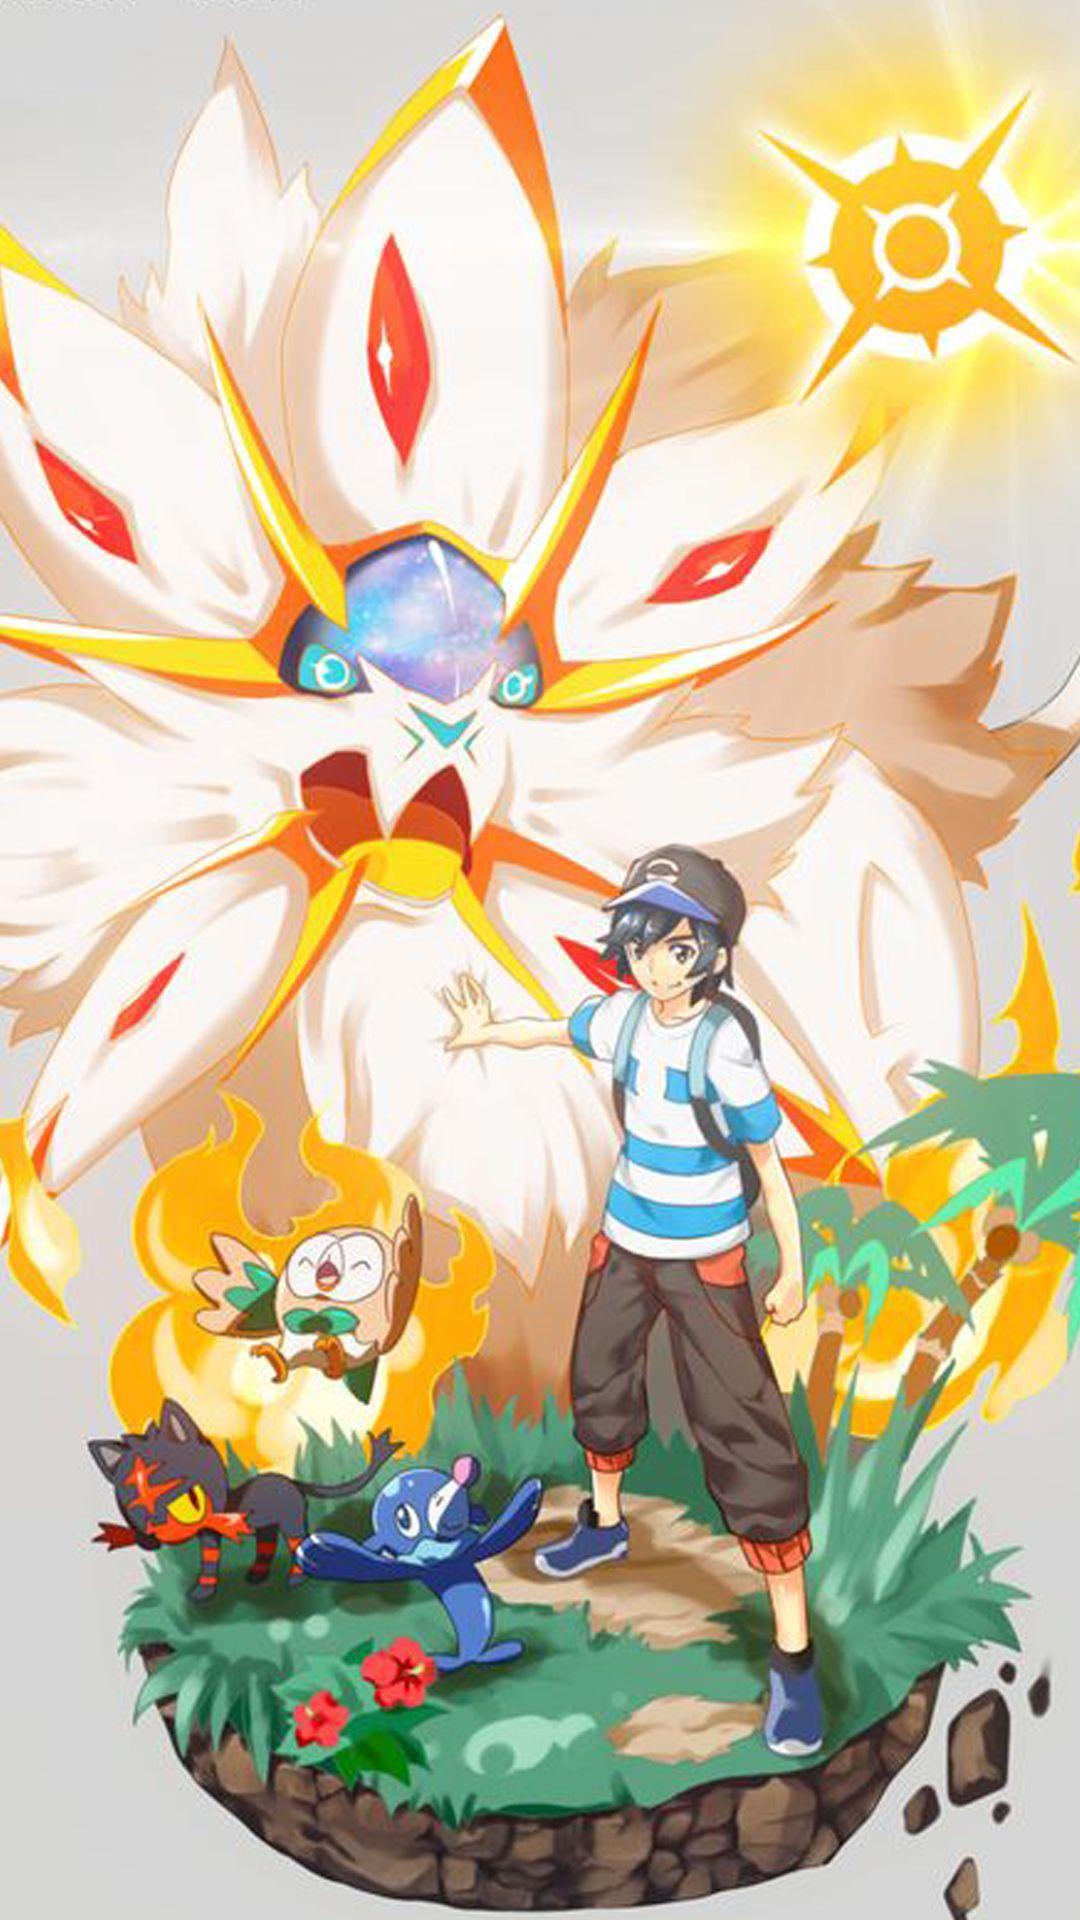 Wallpapers Of Pokemon